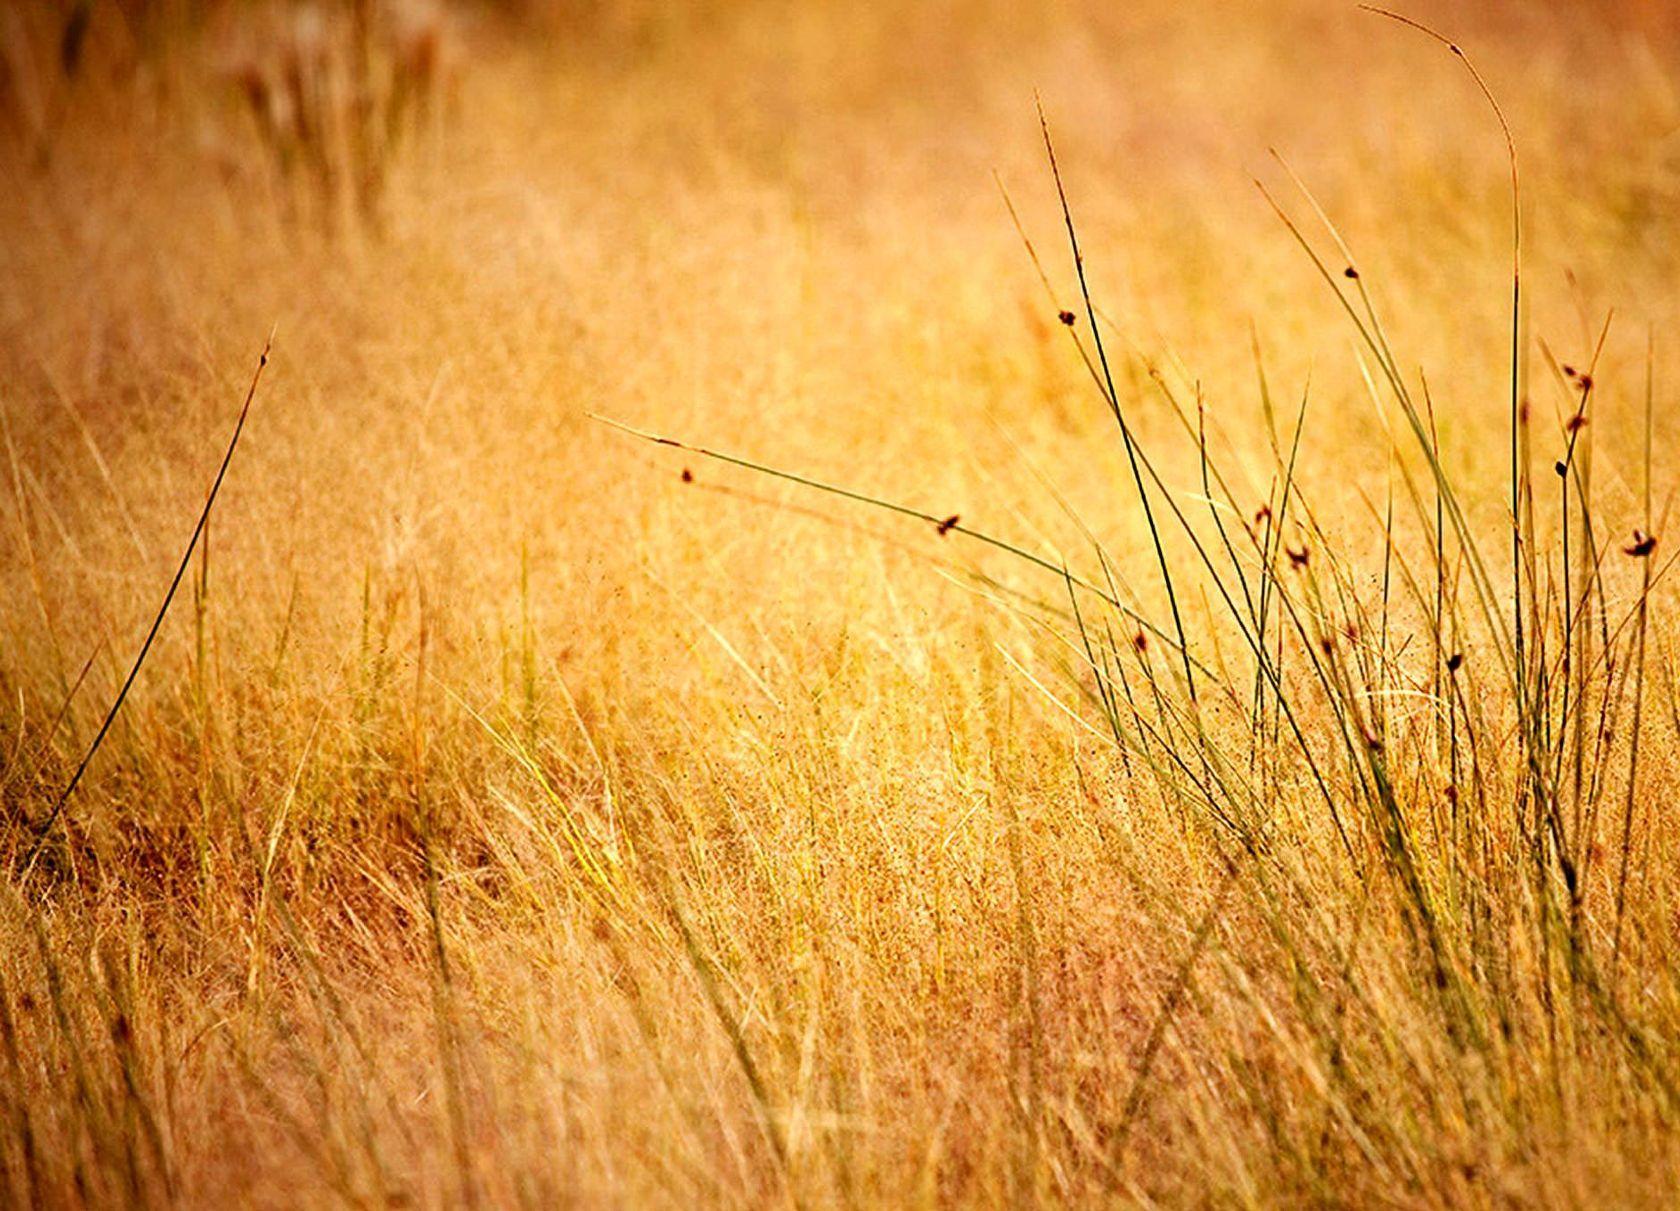 Land Natural Western Backgrounds